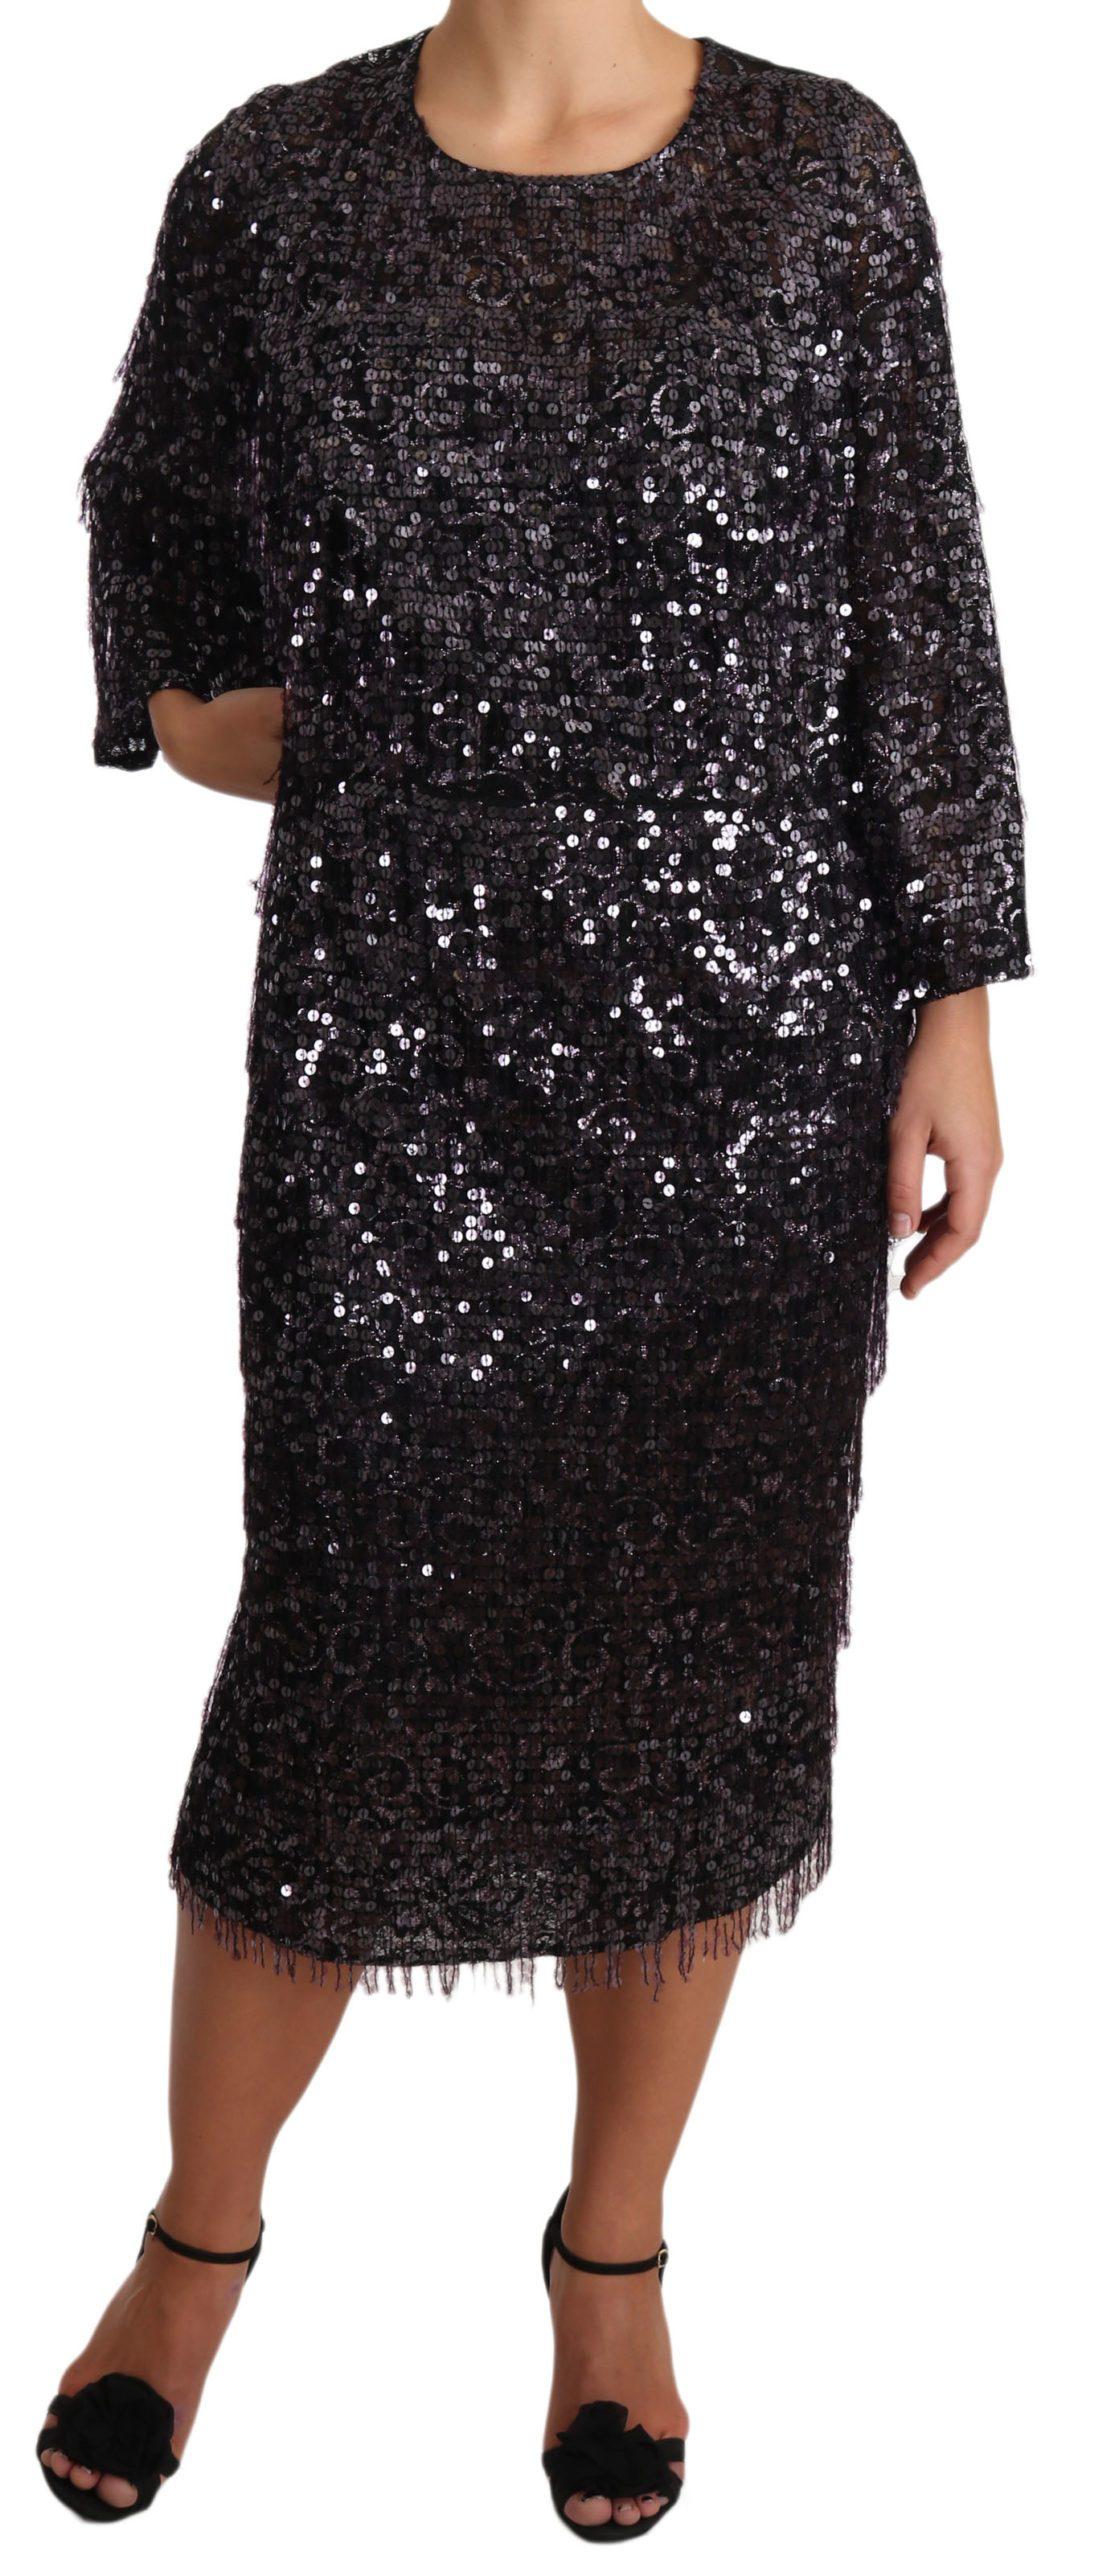 Dolce & Gabbana Women's Dress Black DR1929 - IT42 M